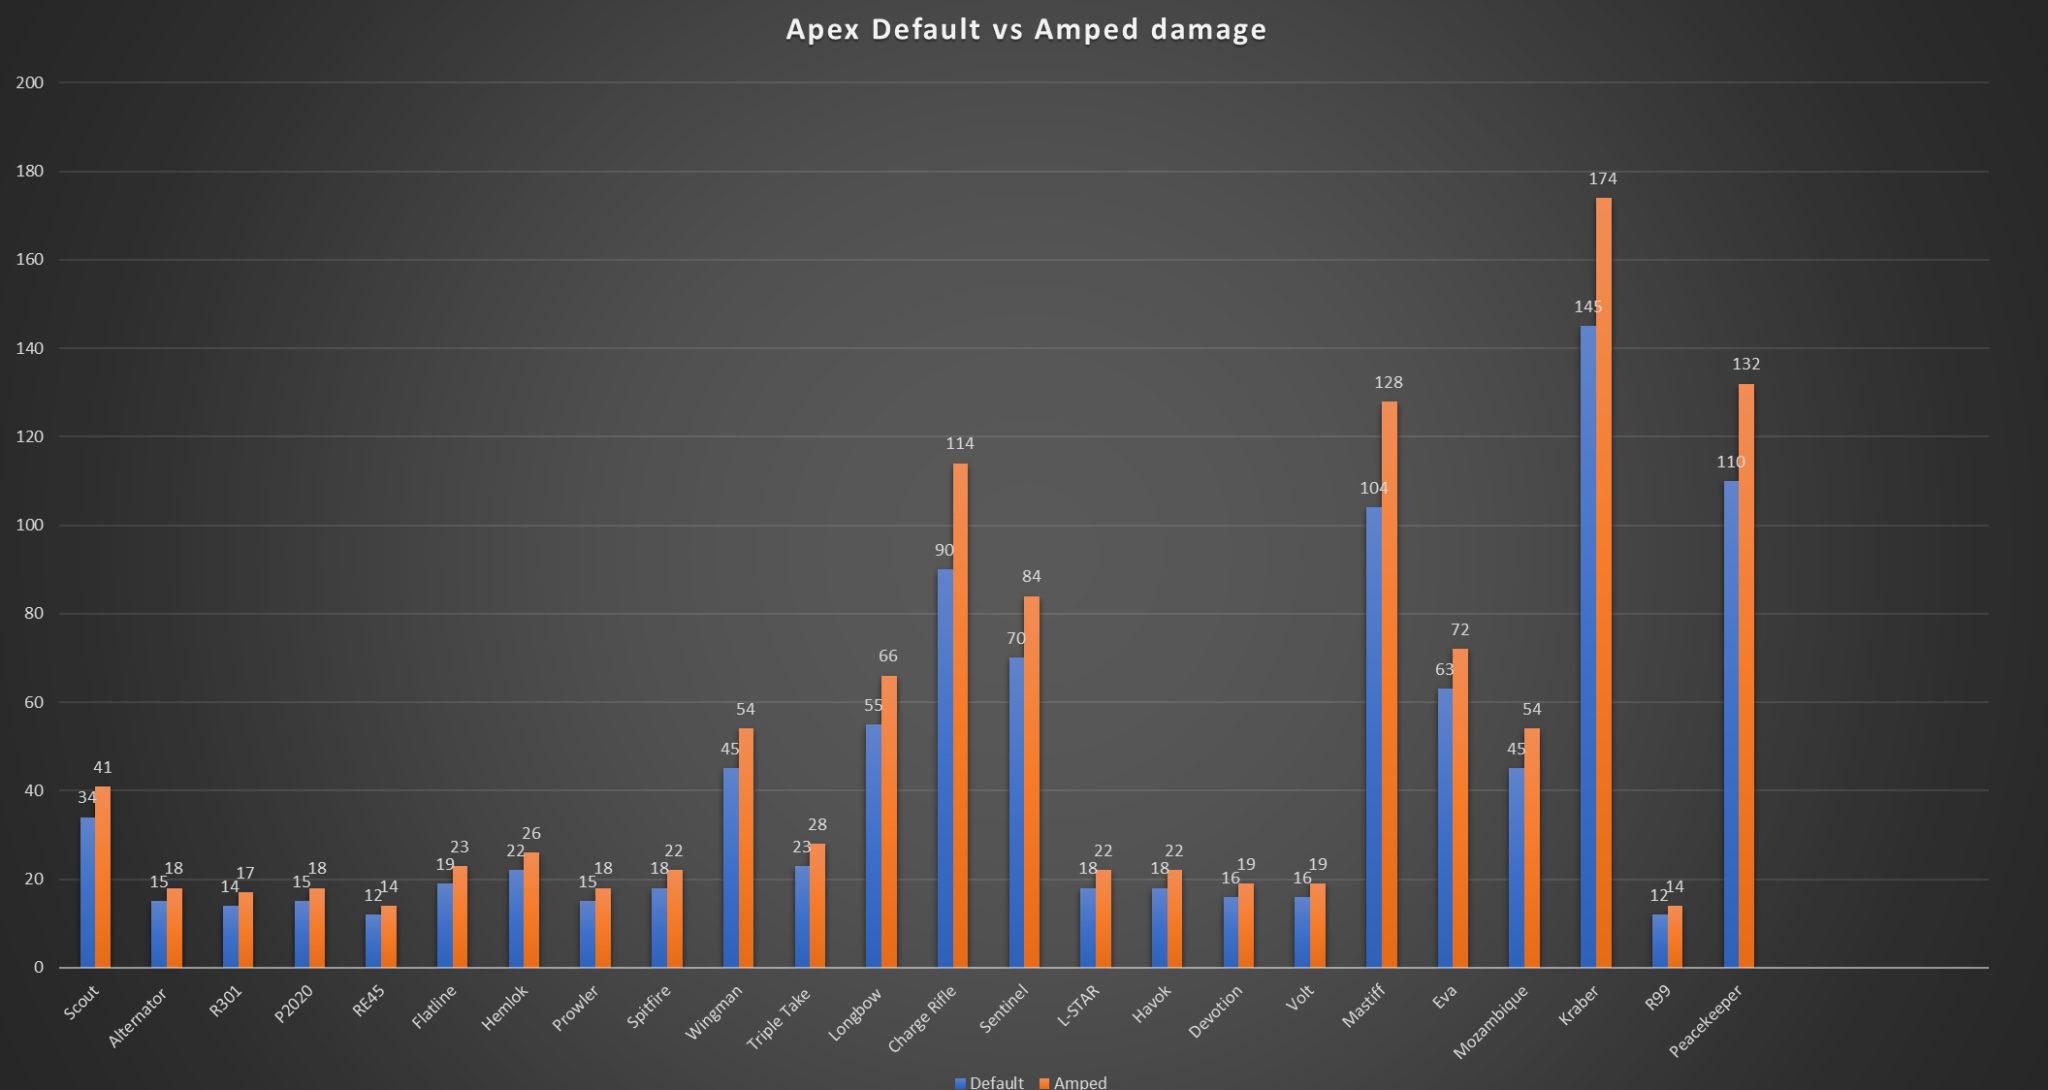 Apex Legends will get an updated training mode soon